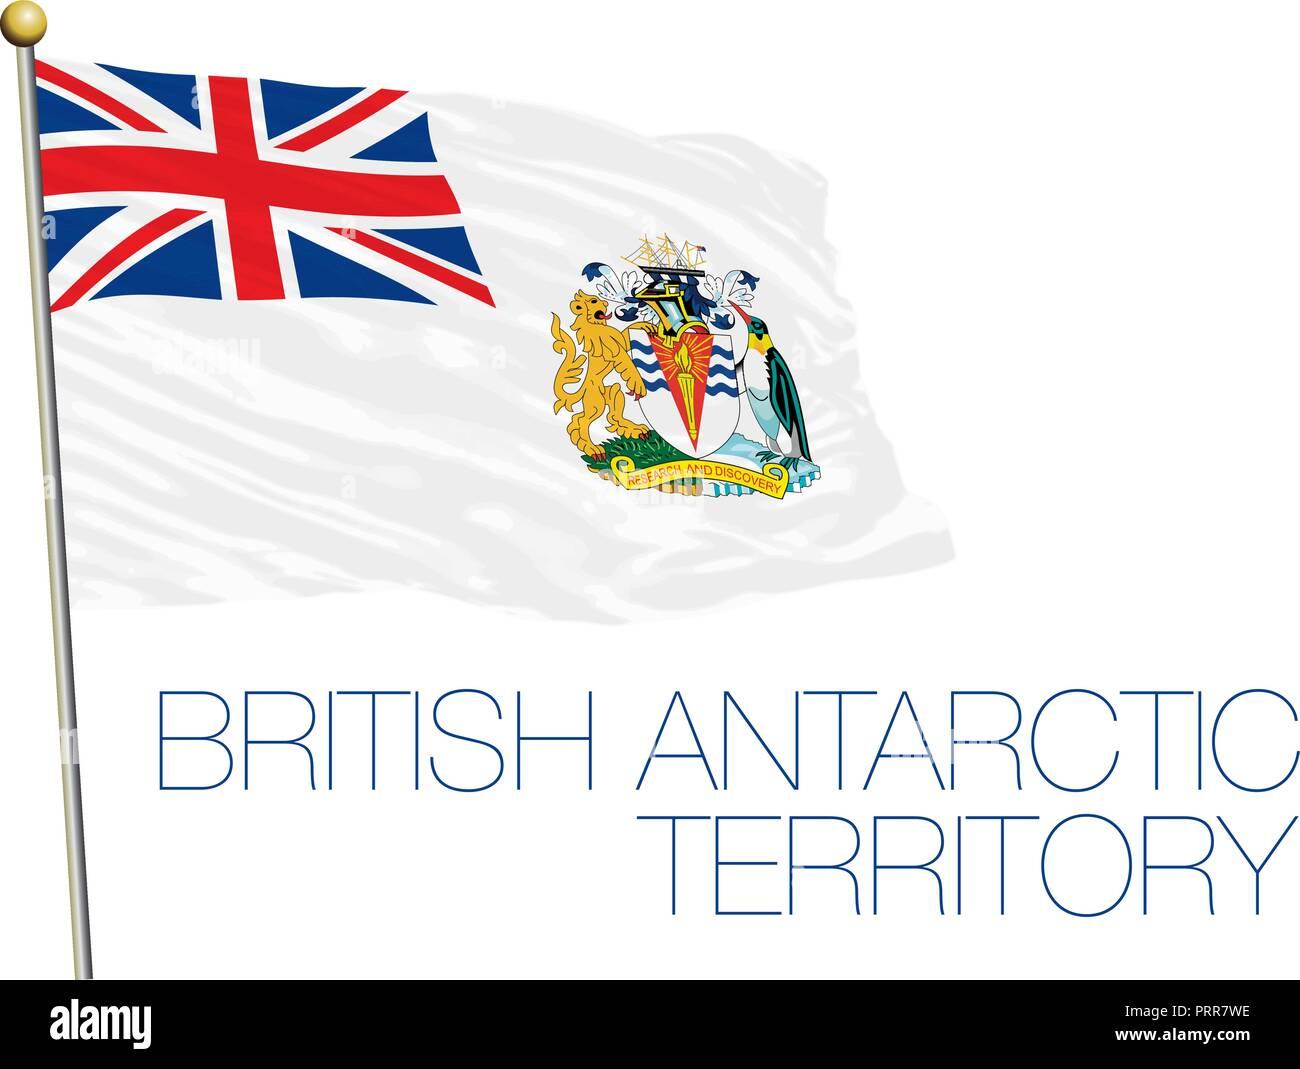 British Antarctic Territory official flag, vector illustration - Stock Vector